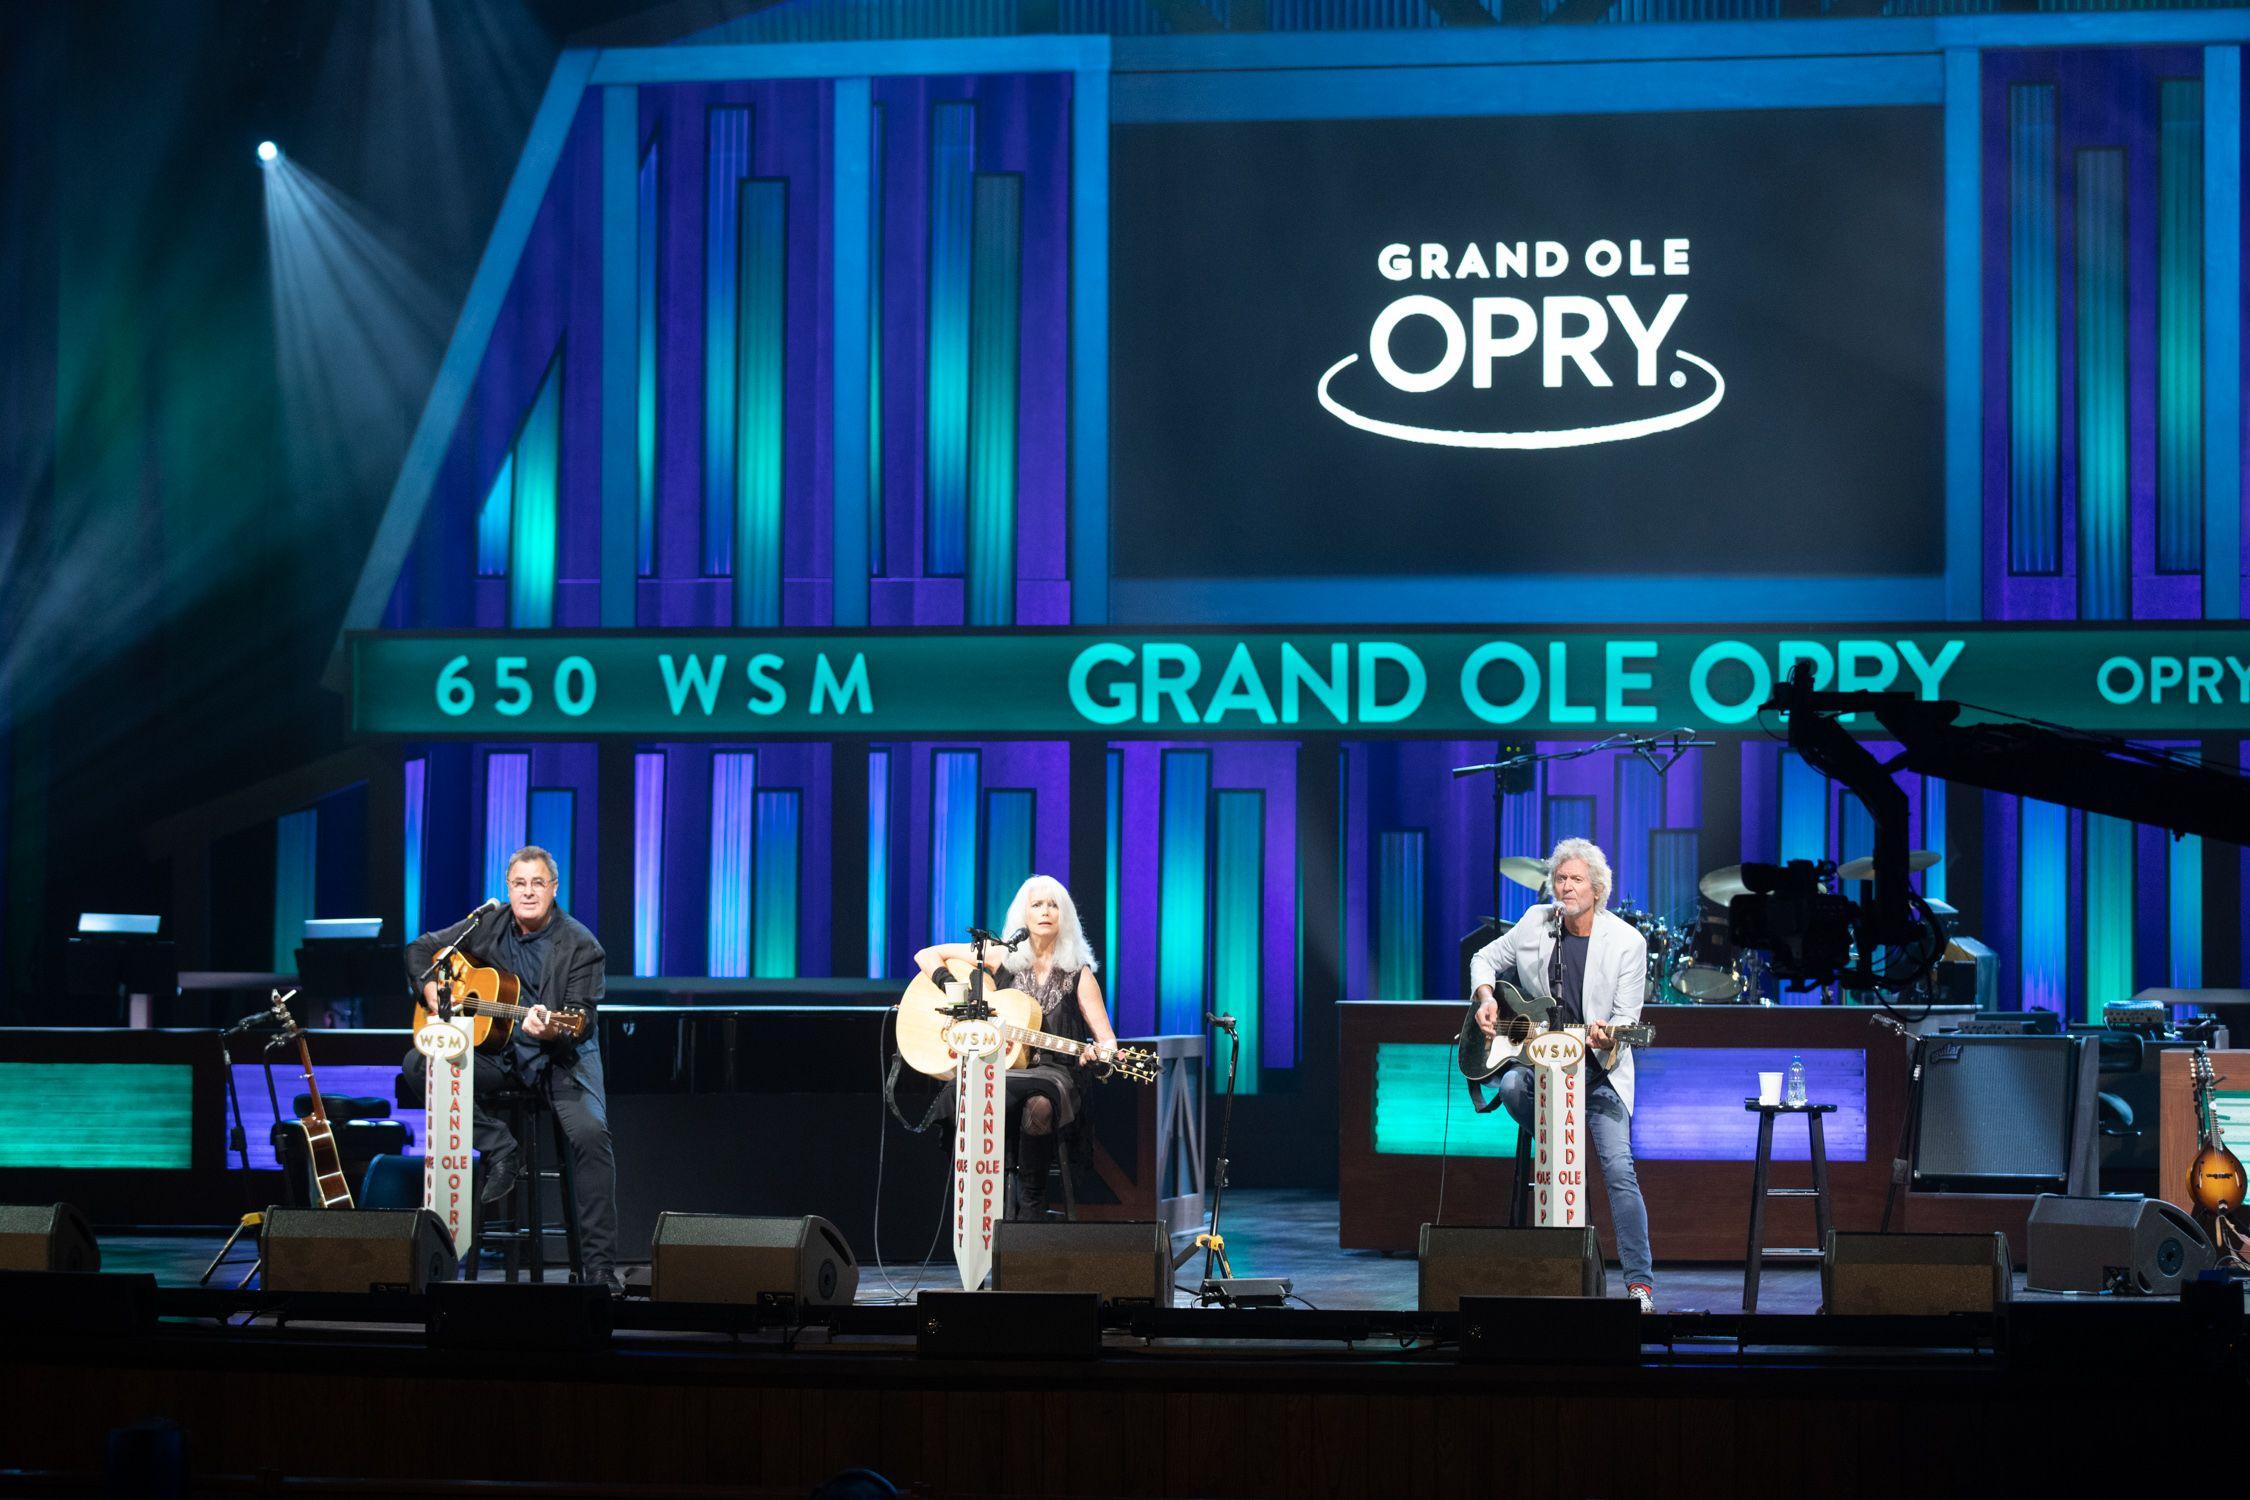 Live - Opry Rodney Crowell Emmylou Harris & Vince Gill